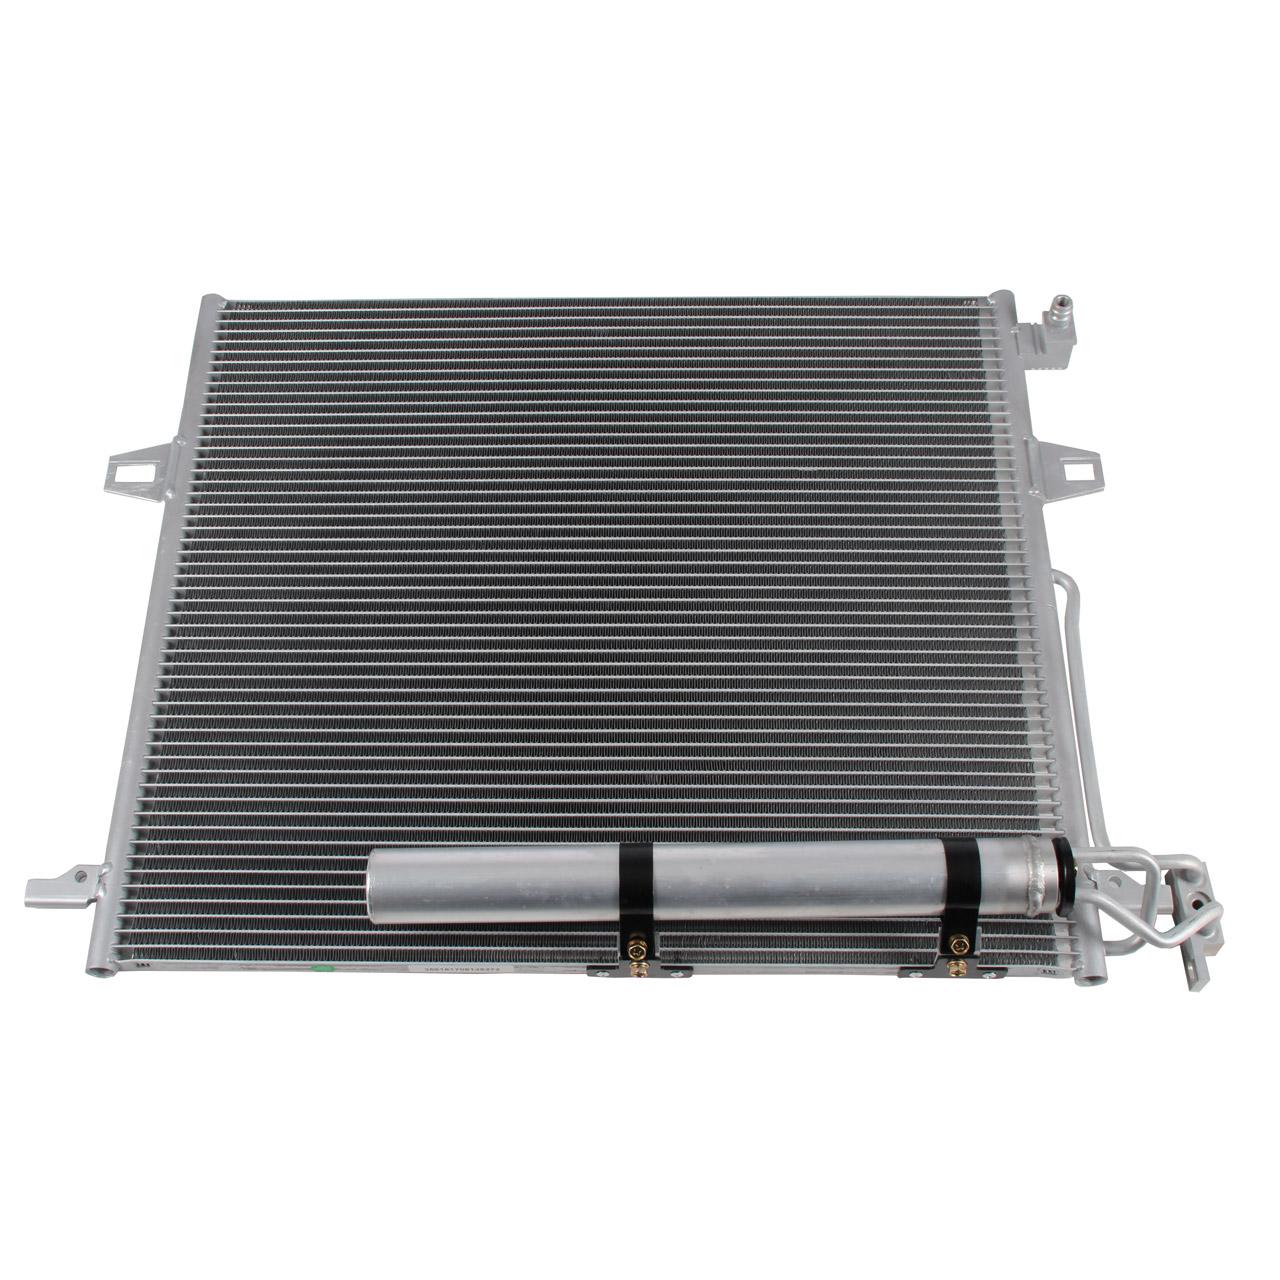 NRF 35618 Kondensator EASY FIT MERCEDES M-Klasse W164 R-Klasse W251 GL X164 2515000054